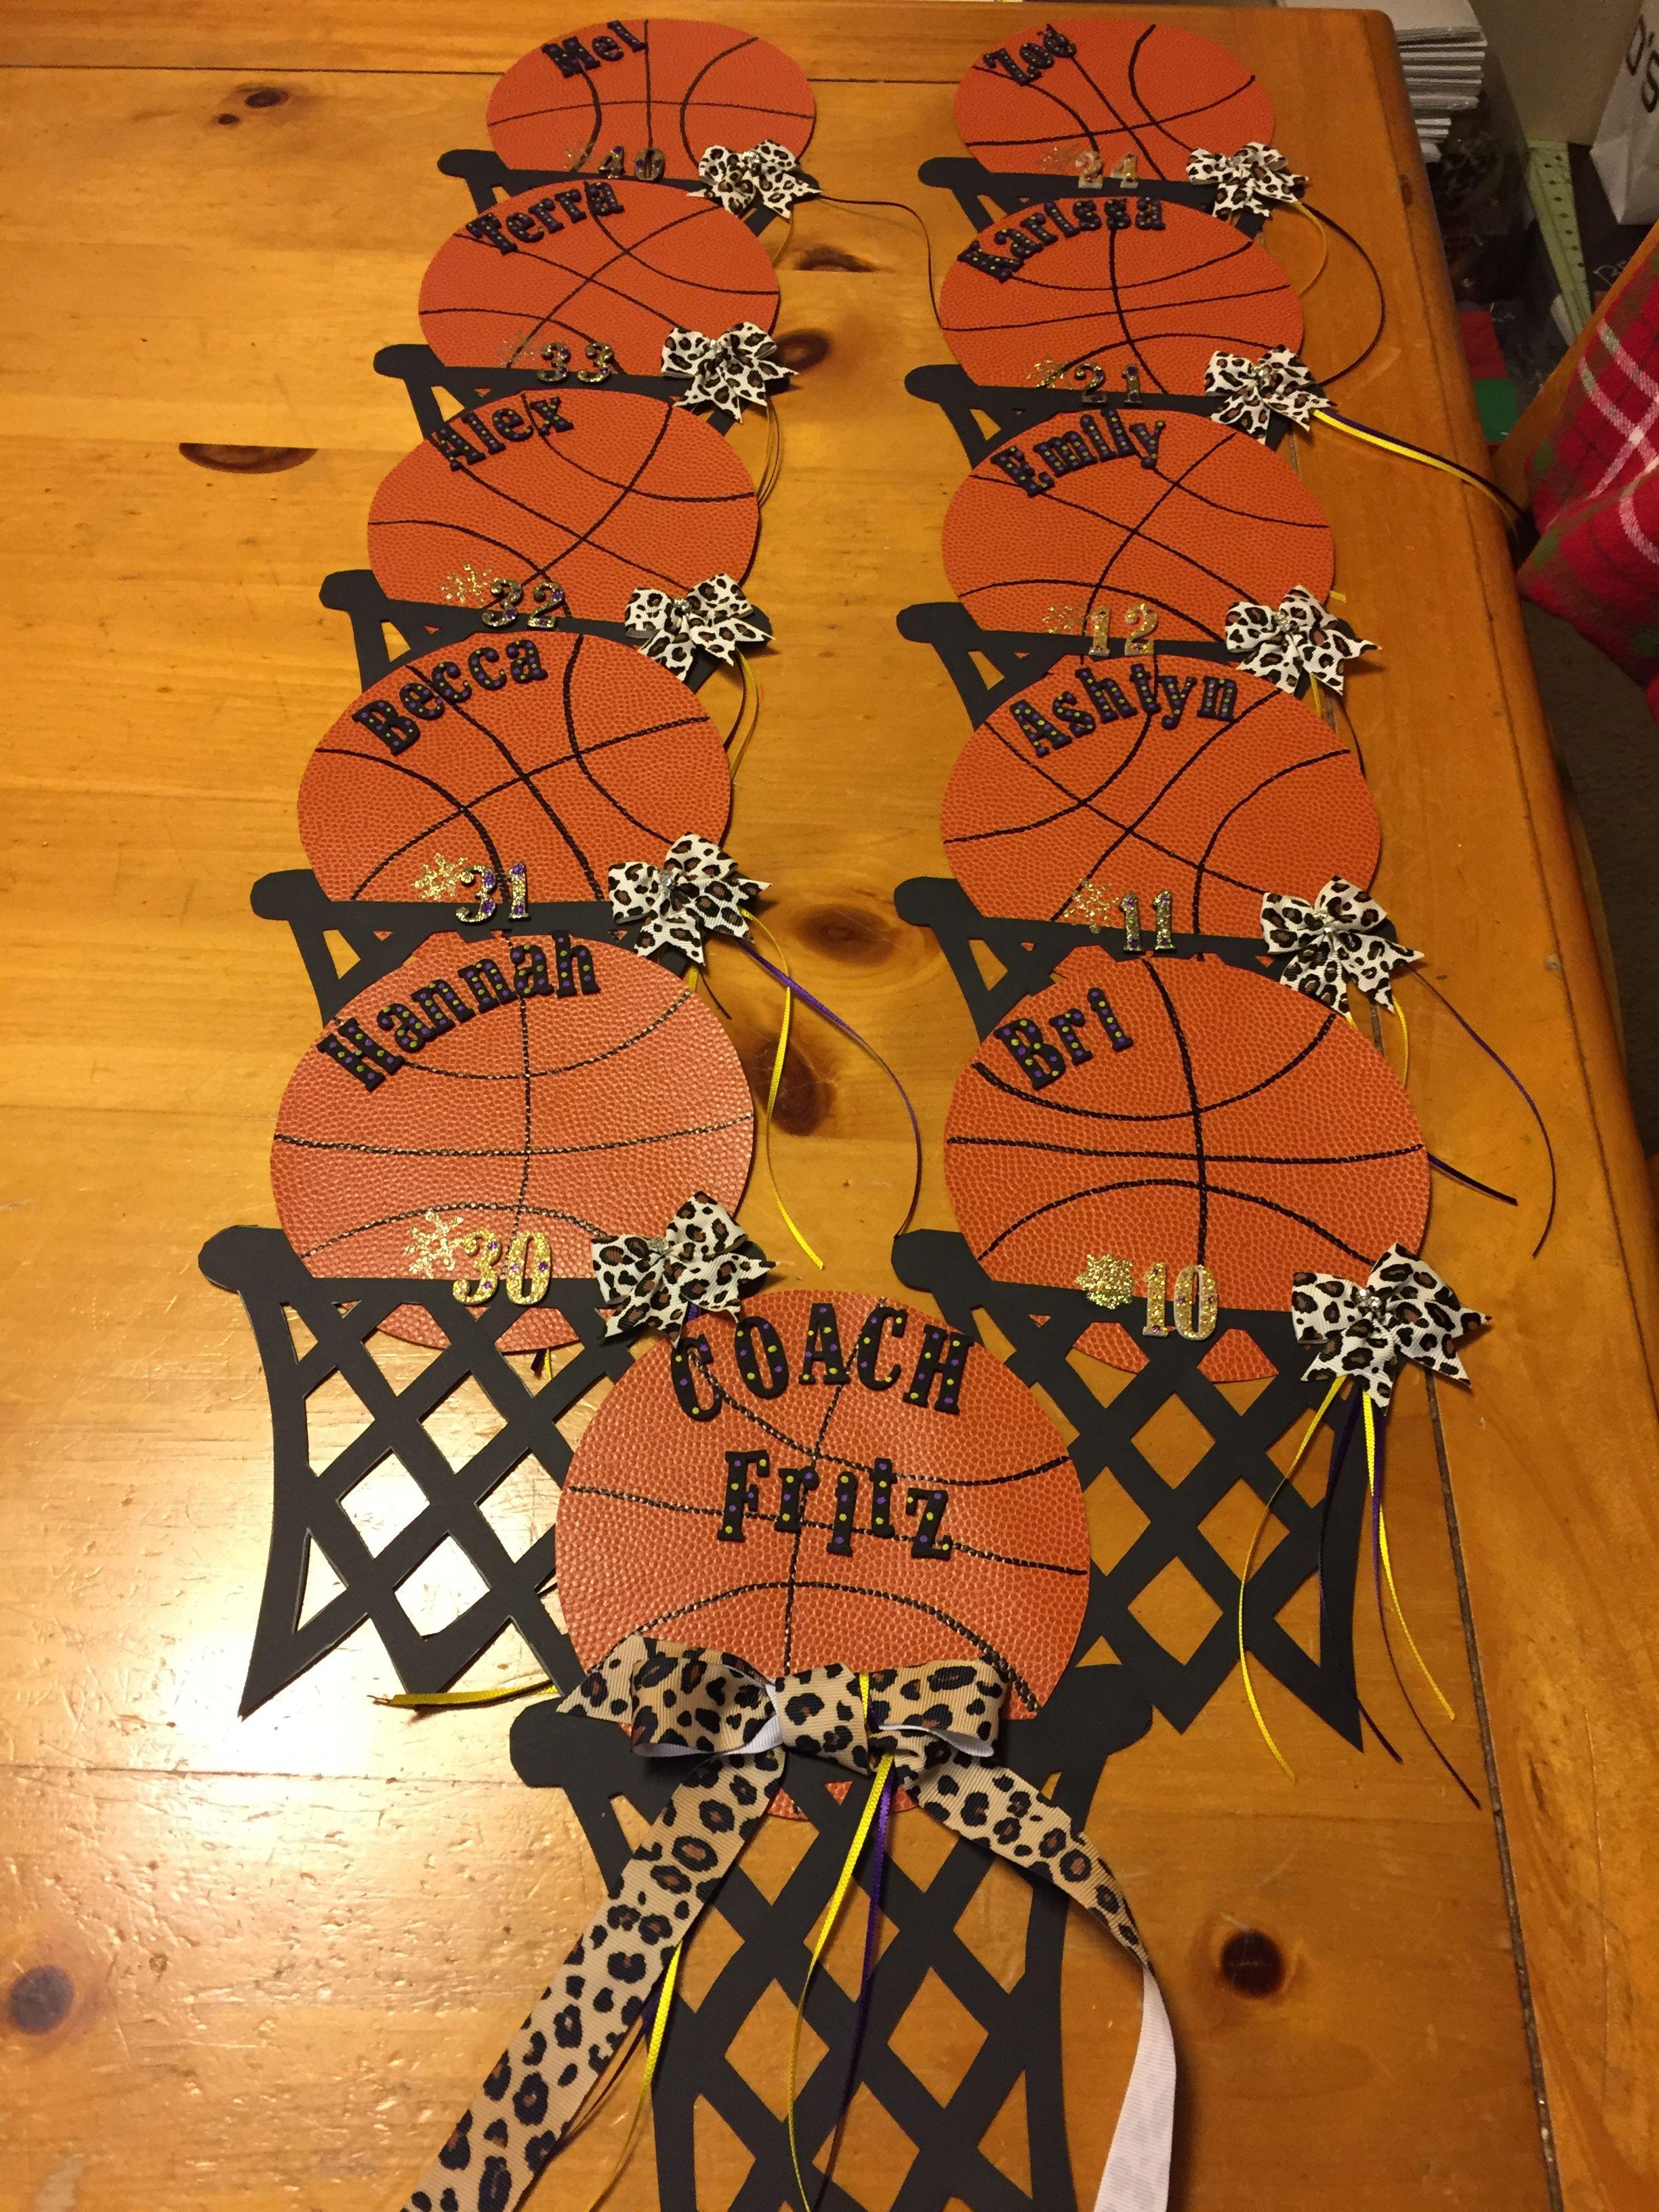 Basketball player locker decoration | decorations | Pinterest